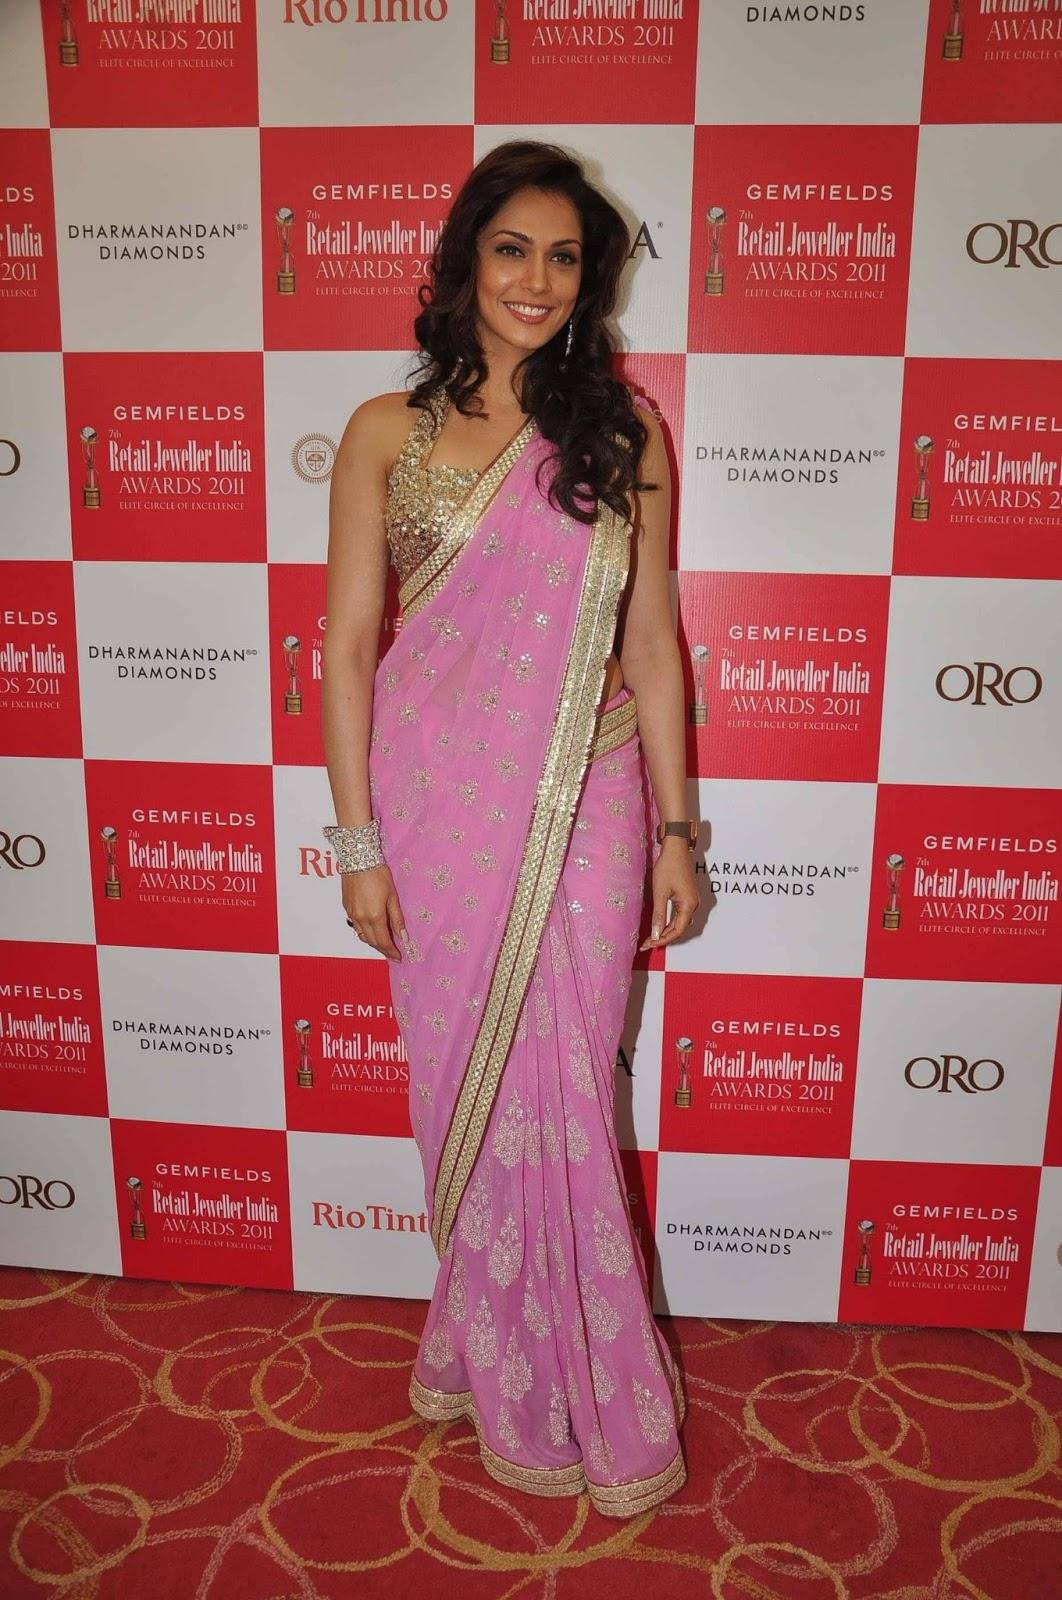 Suave Isha koppikar in pink saree